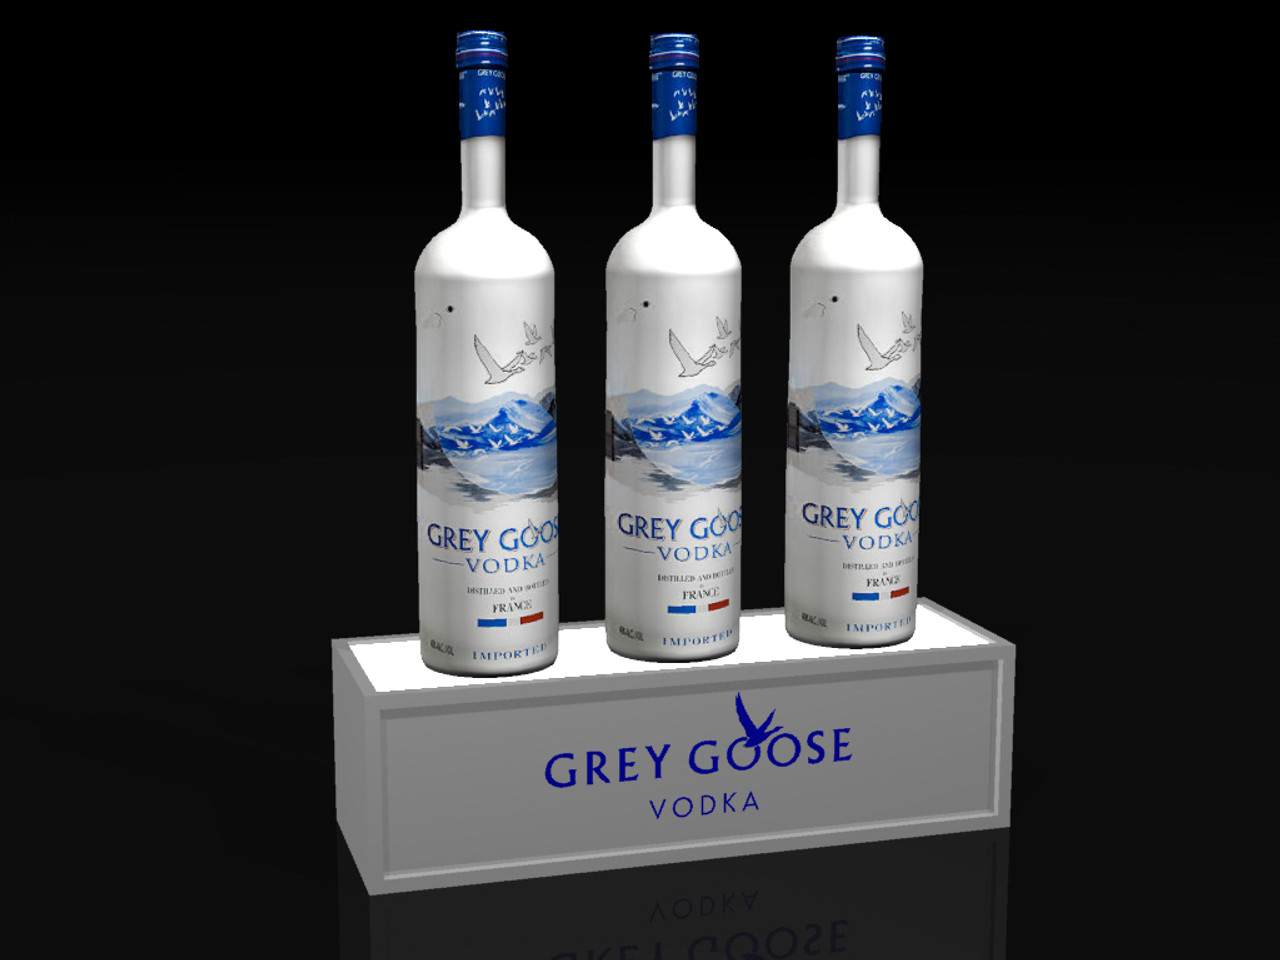 Light up, bottom, Base, Glorifier, Display, stand, shelf, liquor, bottle, bottle service, Grey Goose, Vodka, VIP, POS